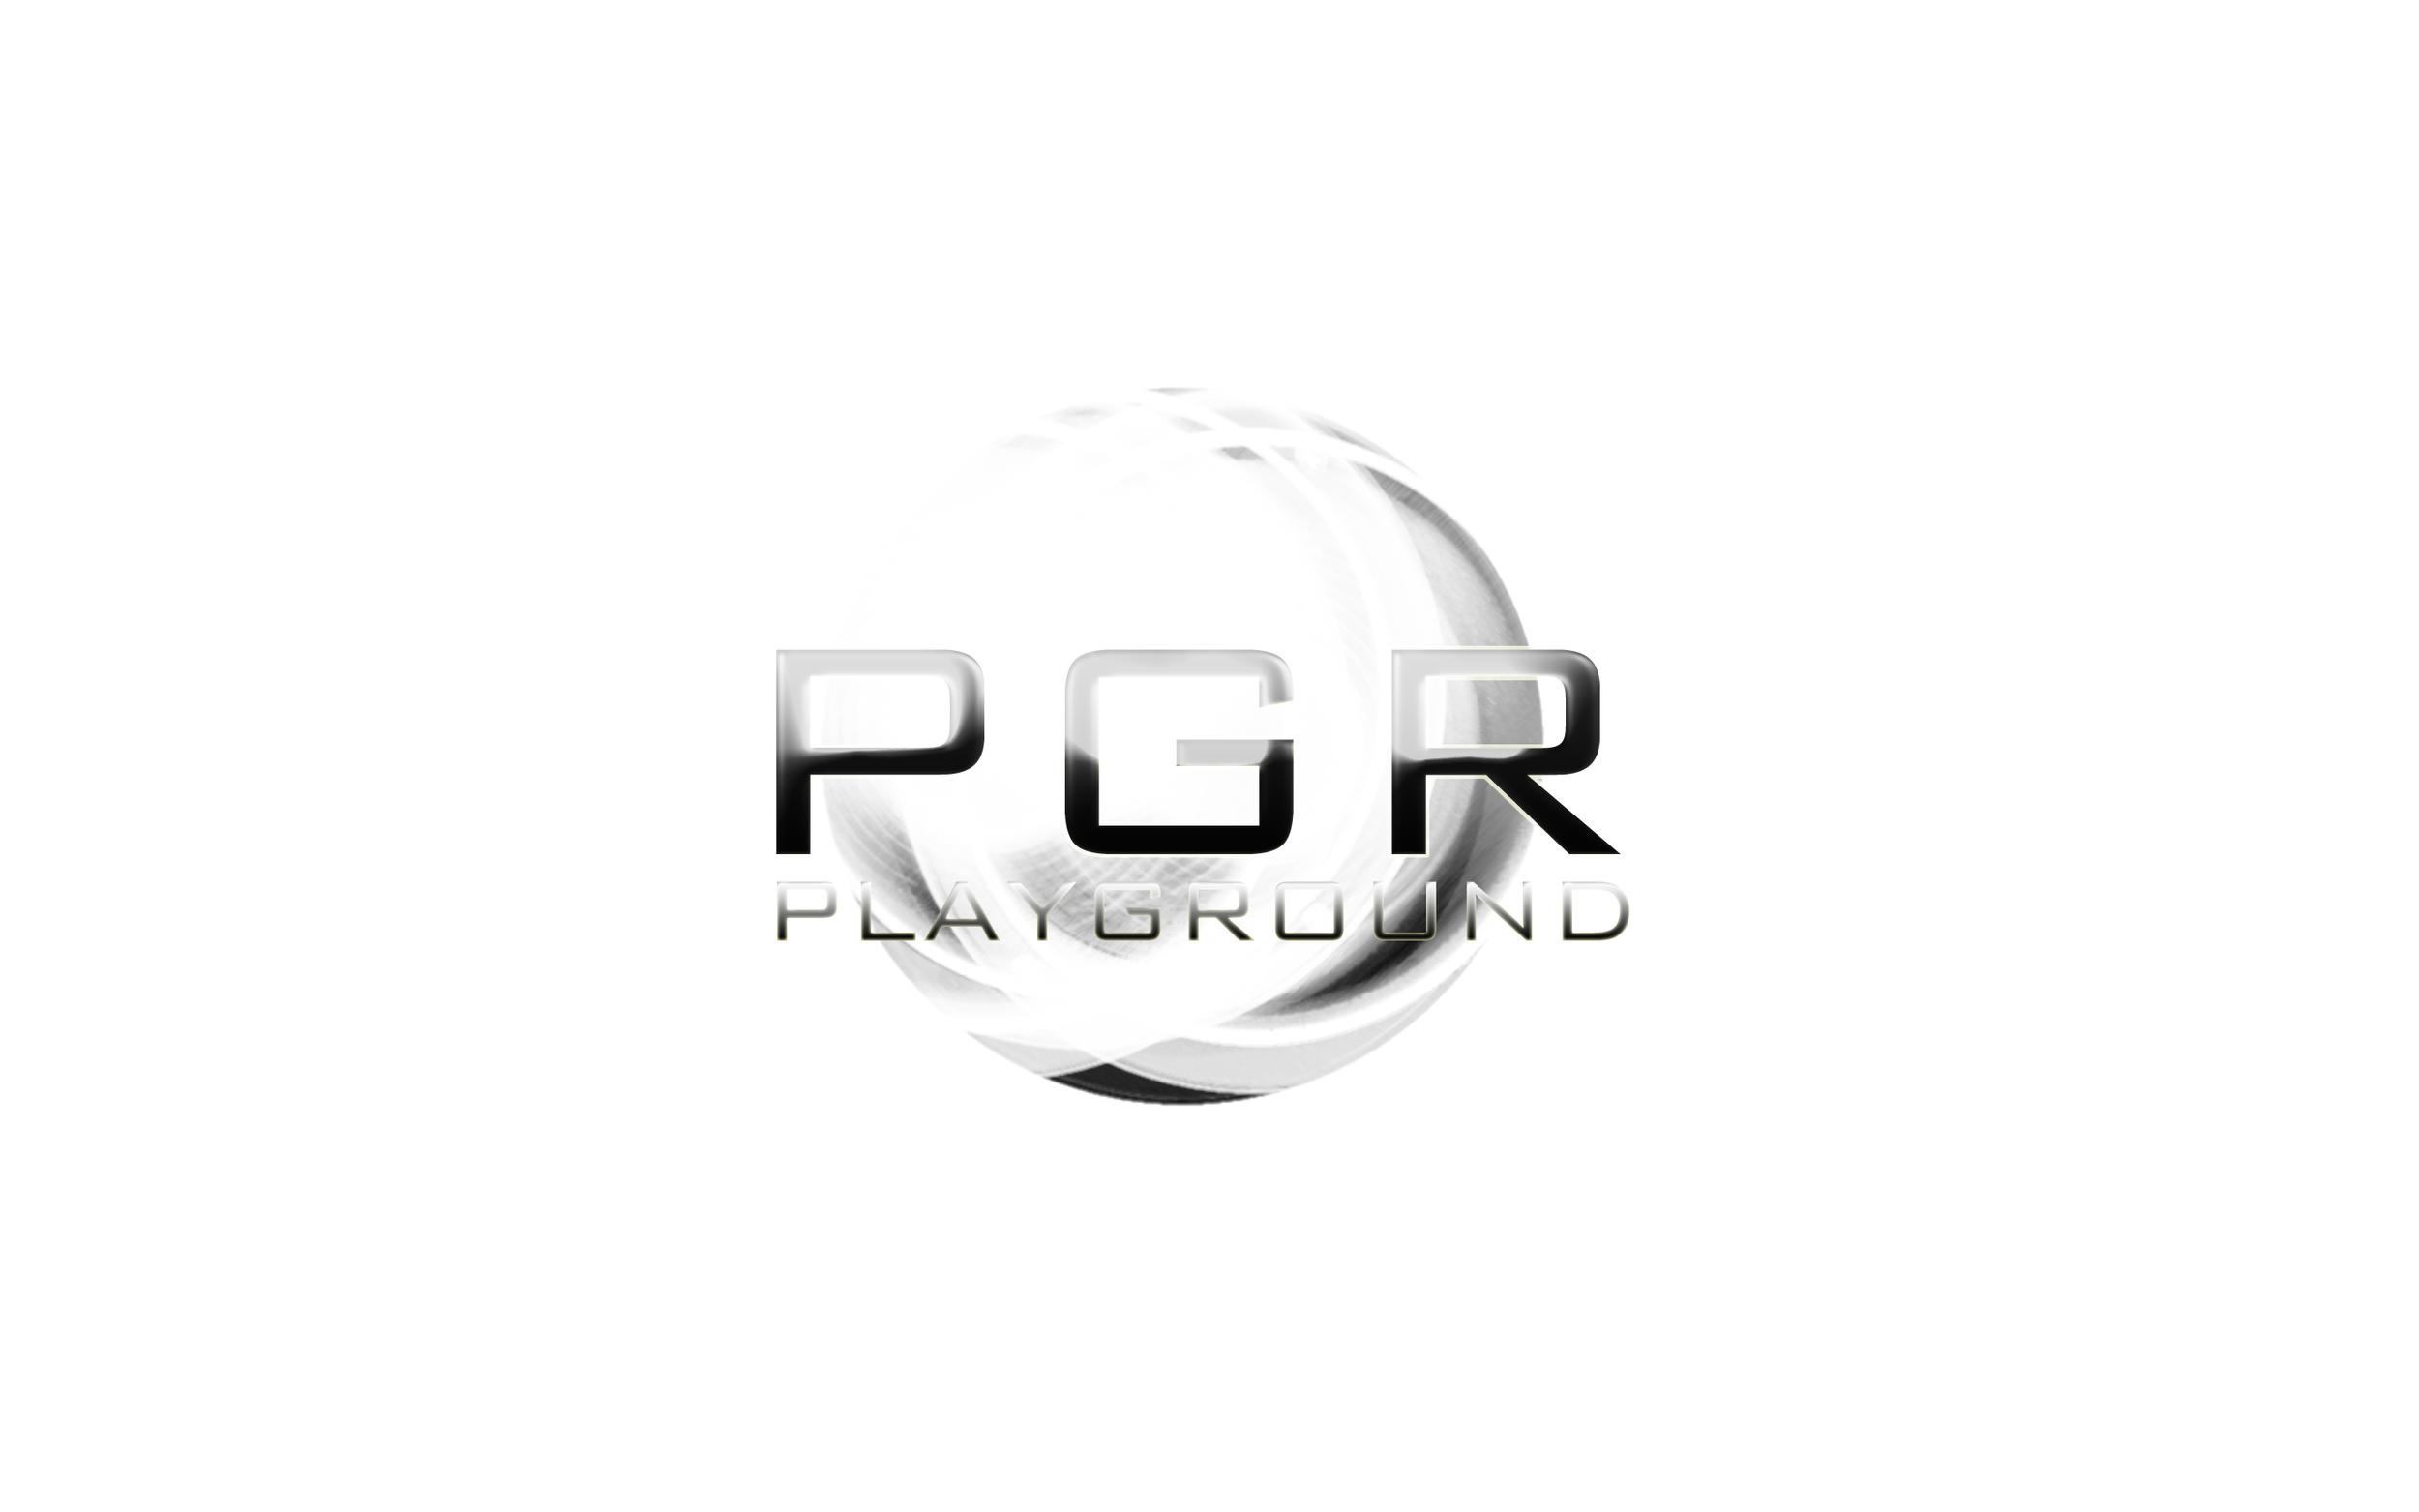 on point logo fun 11 PGR.jpg